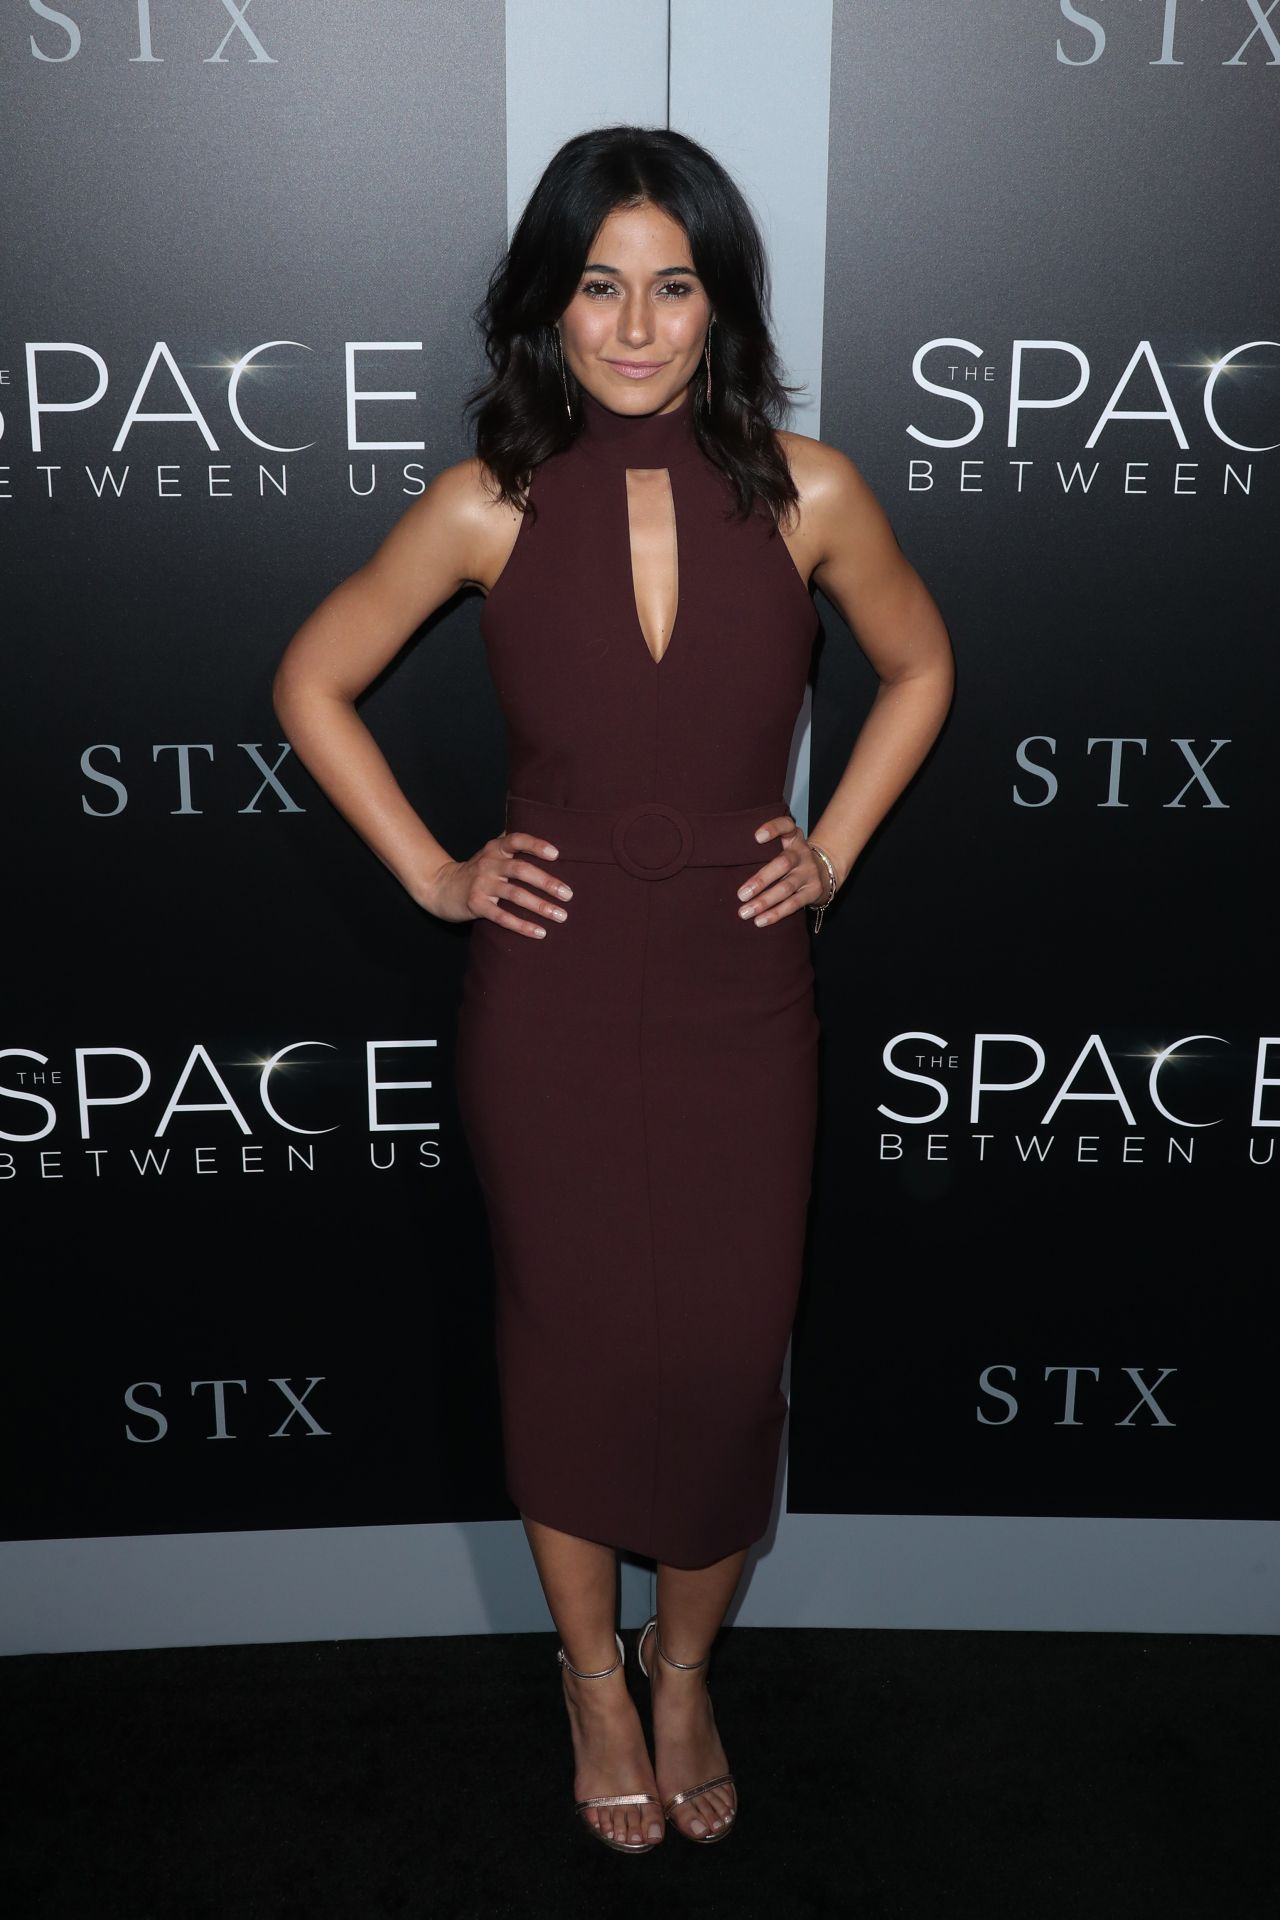 Emmanuelle Chriqui The Space Between Us Premiere In Los